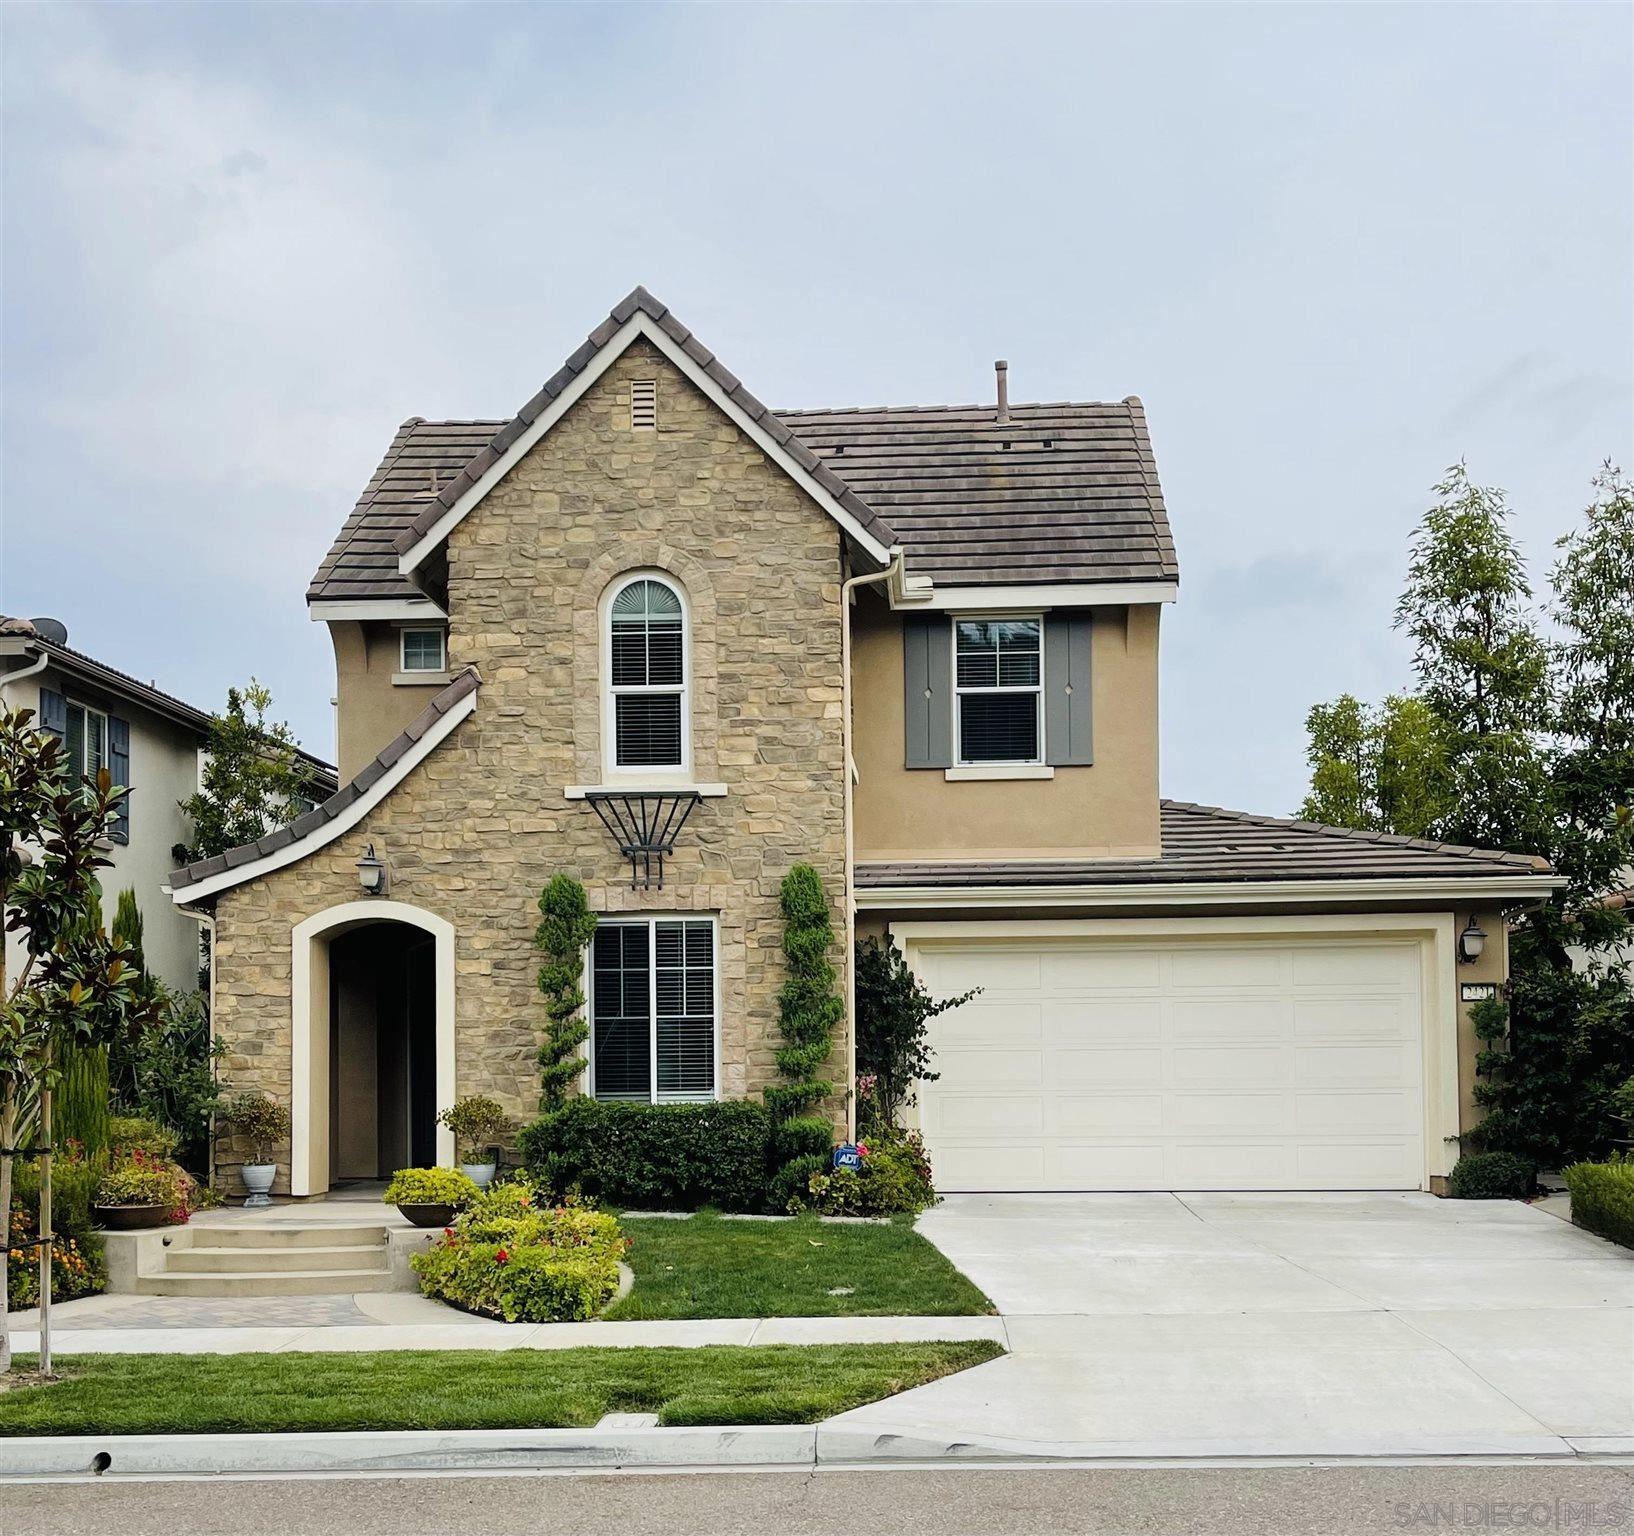 Photo of 2421 Mica Rd., Carlsbad, CA 92009 (MLS # 210020686)